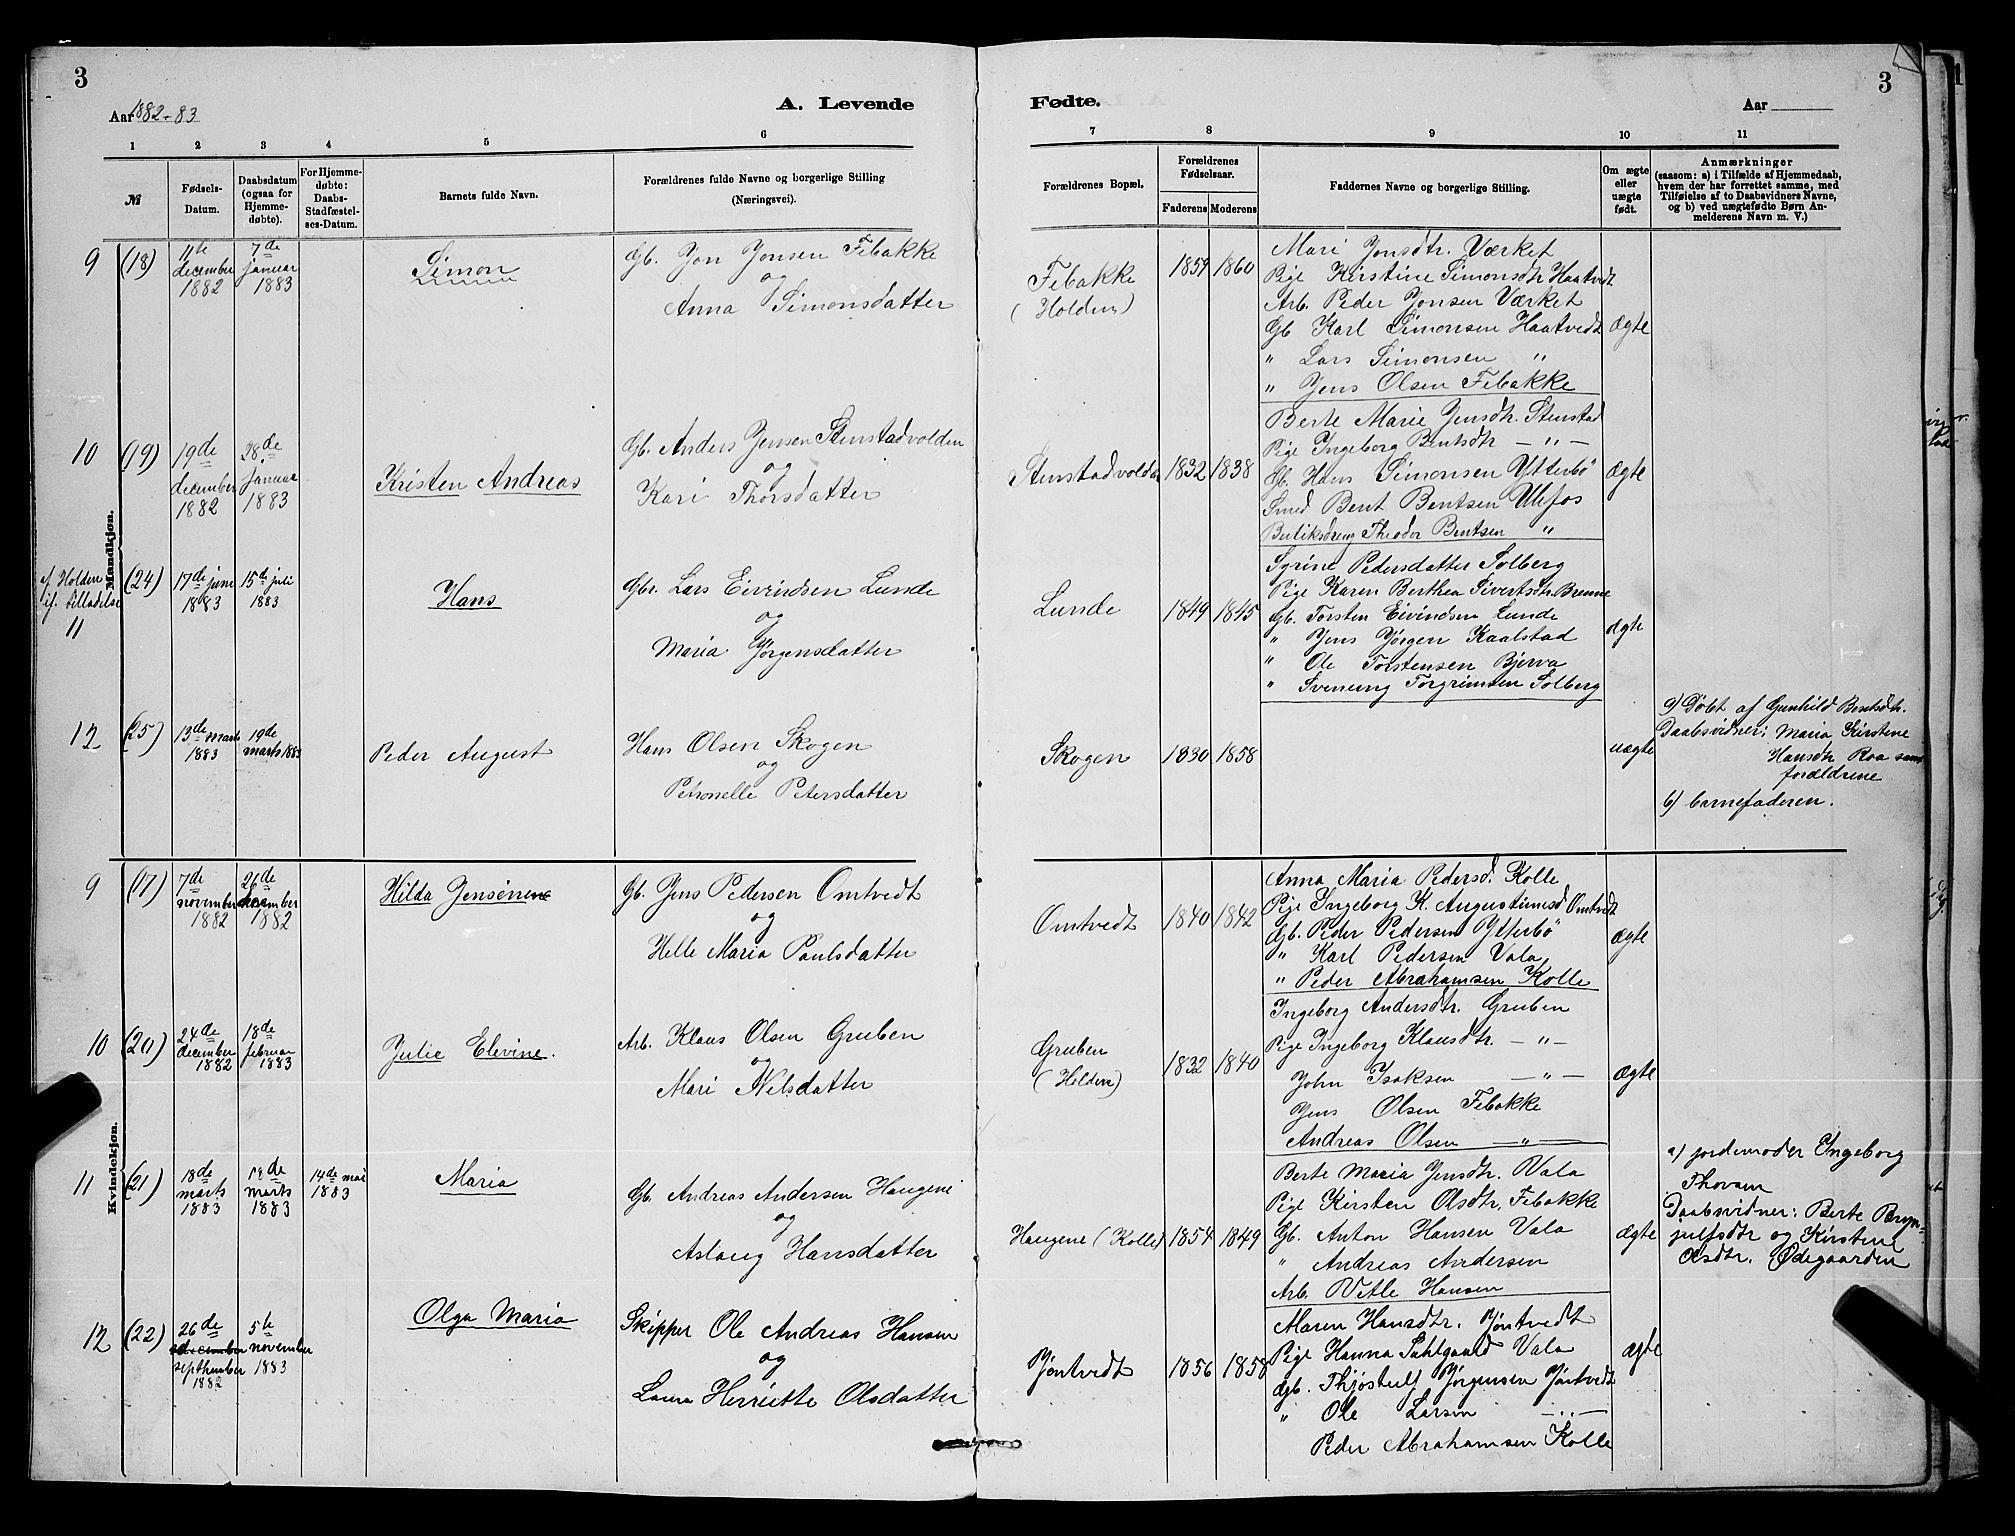 SAKO, Holla kirkebøker, G/Gb/L0001: Klokkerbok nr. II 1, 1882-1897, s. 3